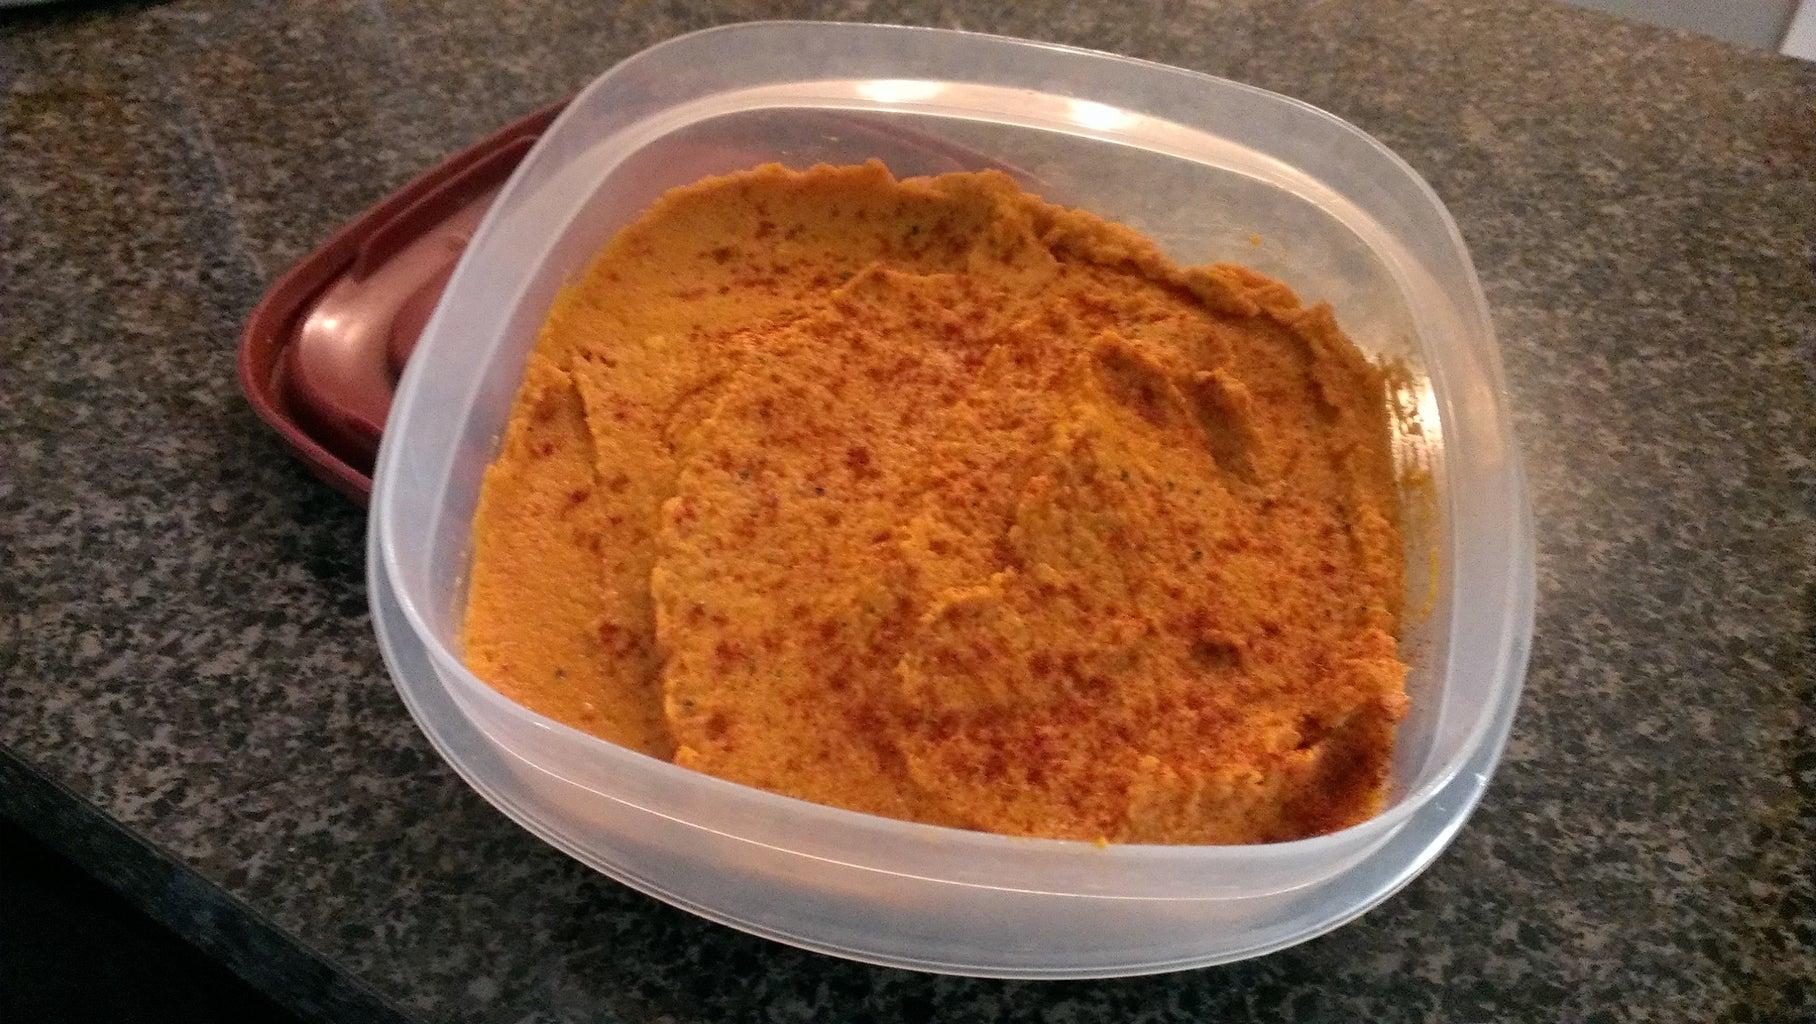 Delicious Hummus Inspired Dip